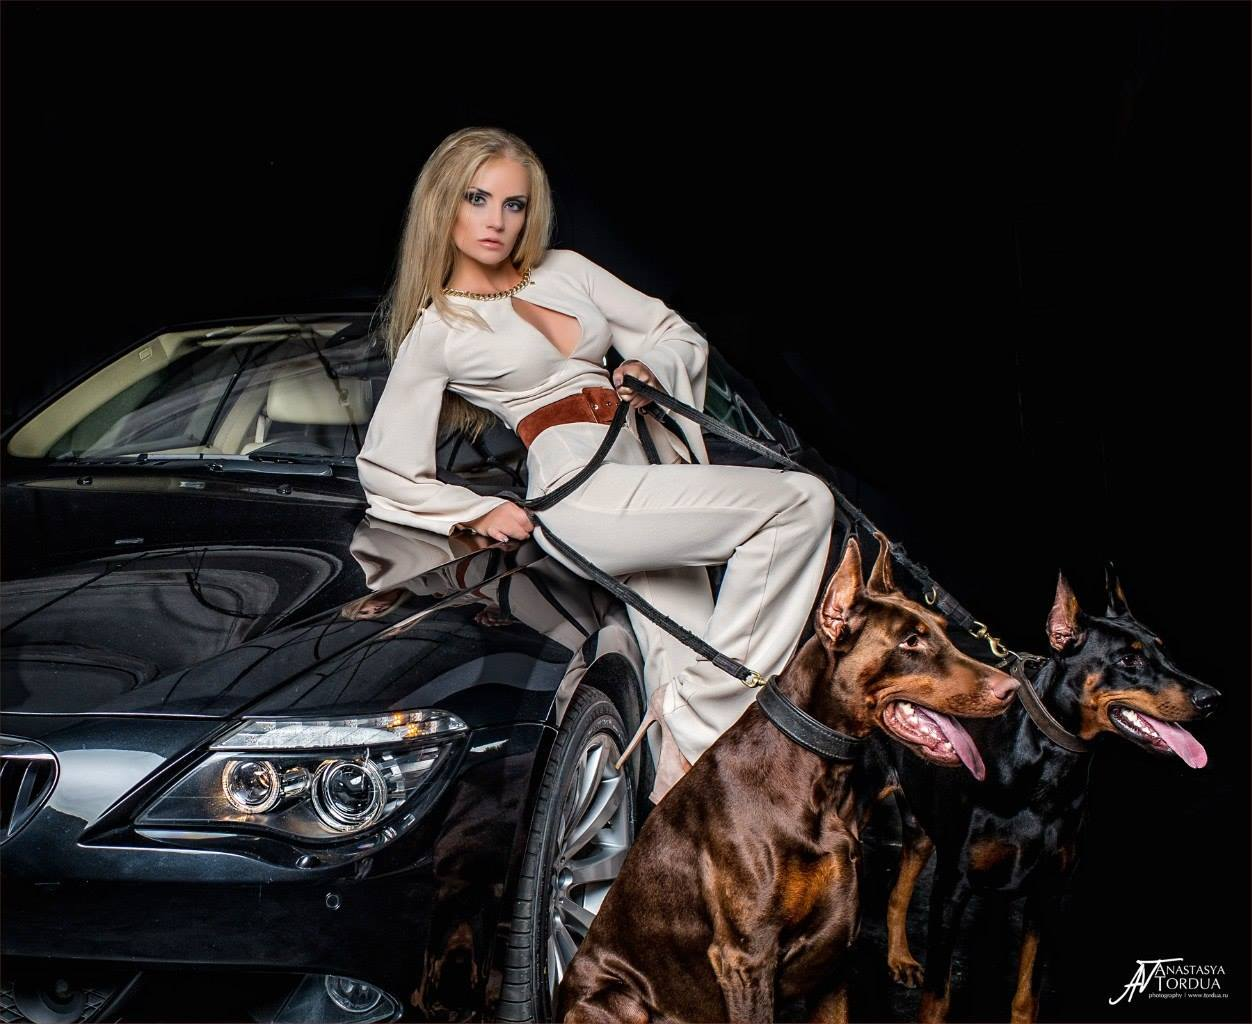 Bmw S1000rr Girl Wallpaper Model Anna Trisvetova Makes Old Bmw 6 Series Look Gangsta